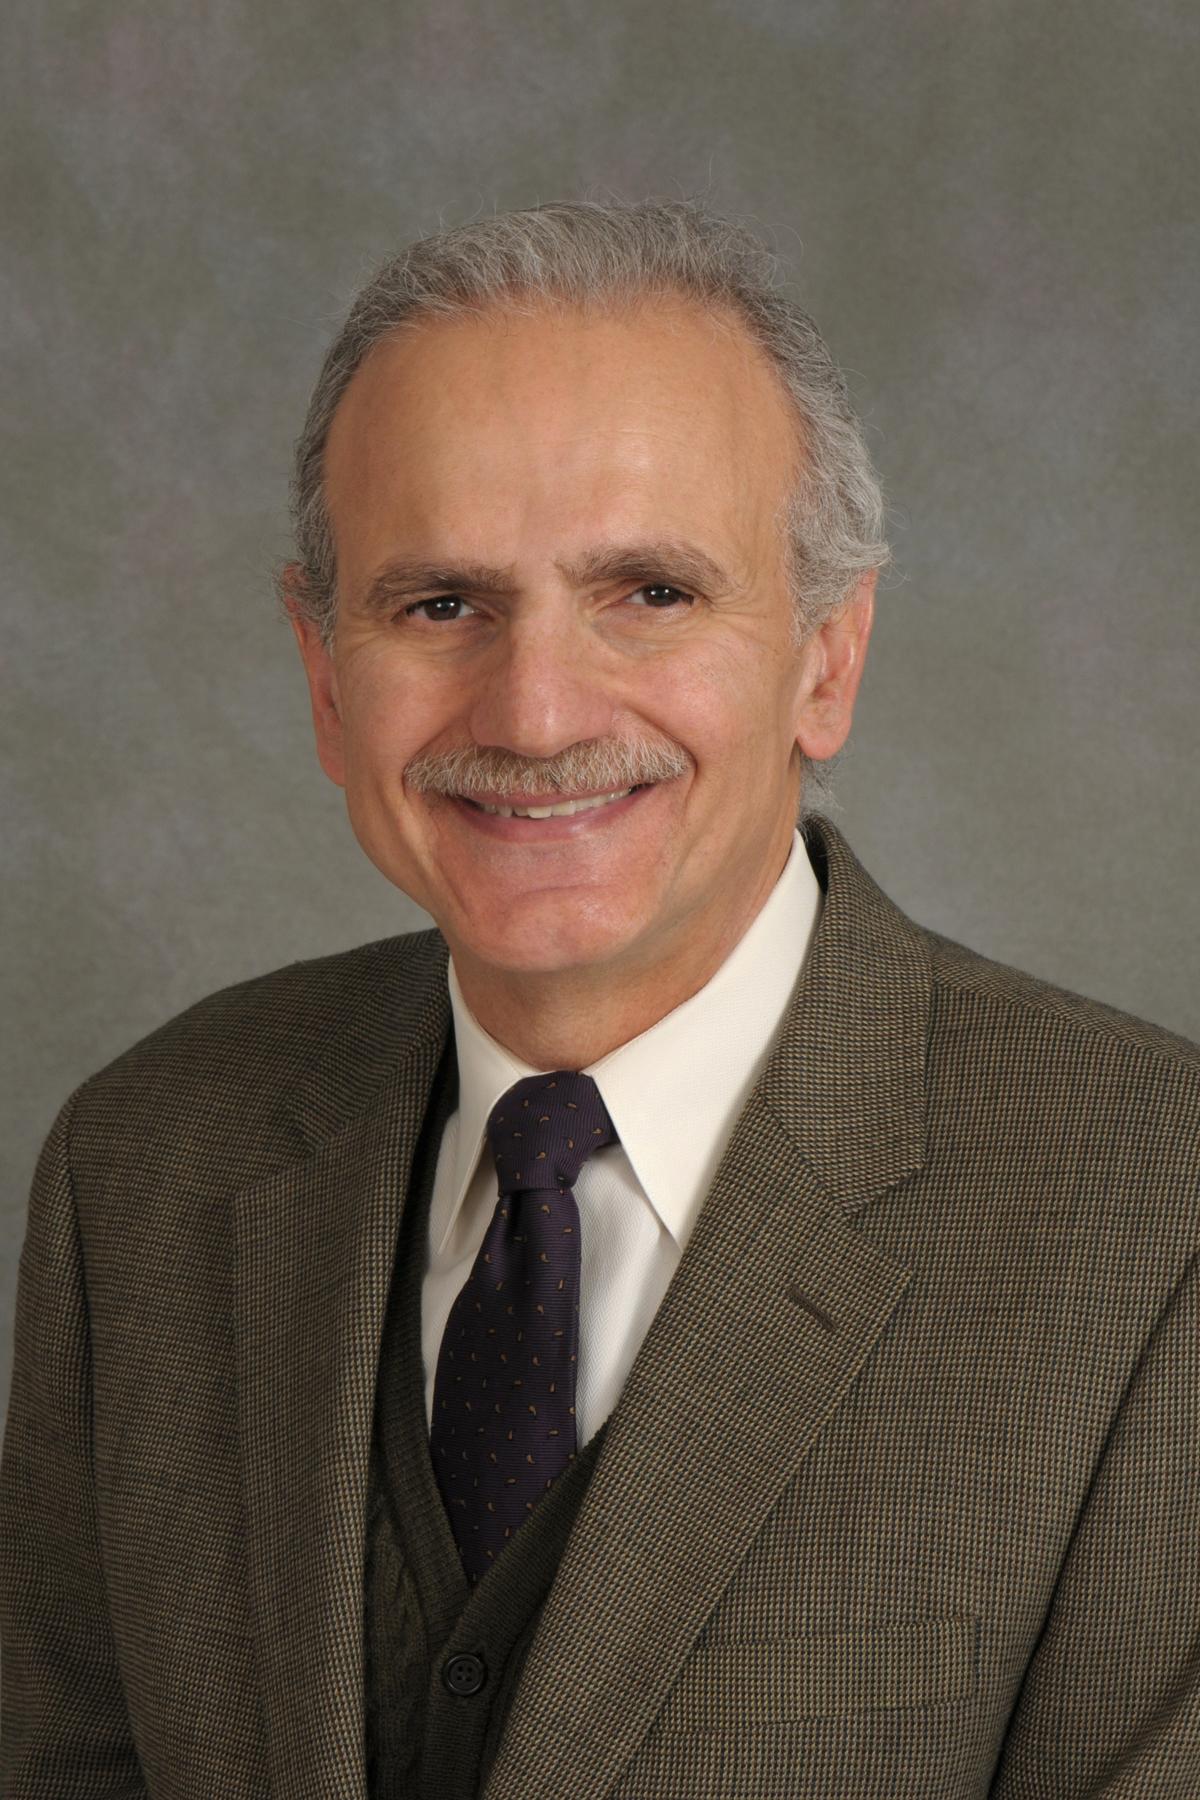 Dr. Yusuf Hannun